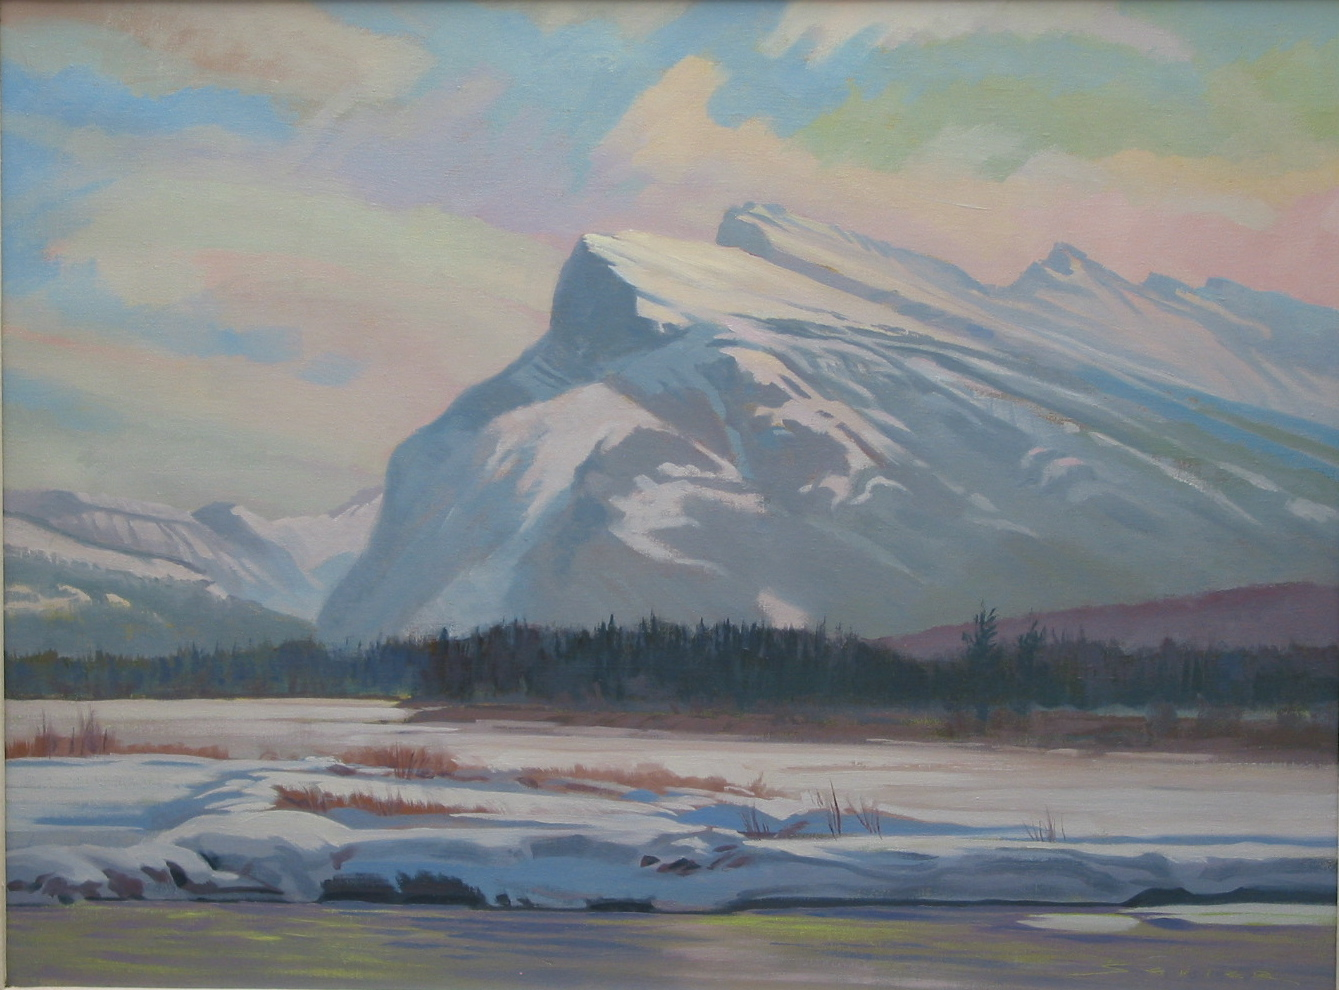 Mount Rundle/Alberta, 24 x 32, oil